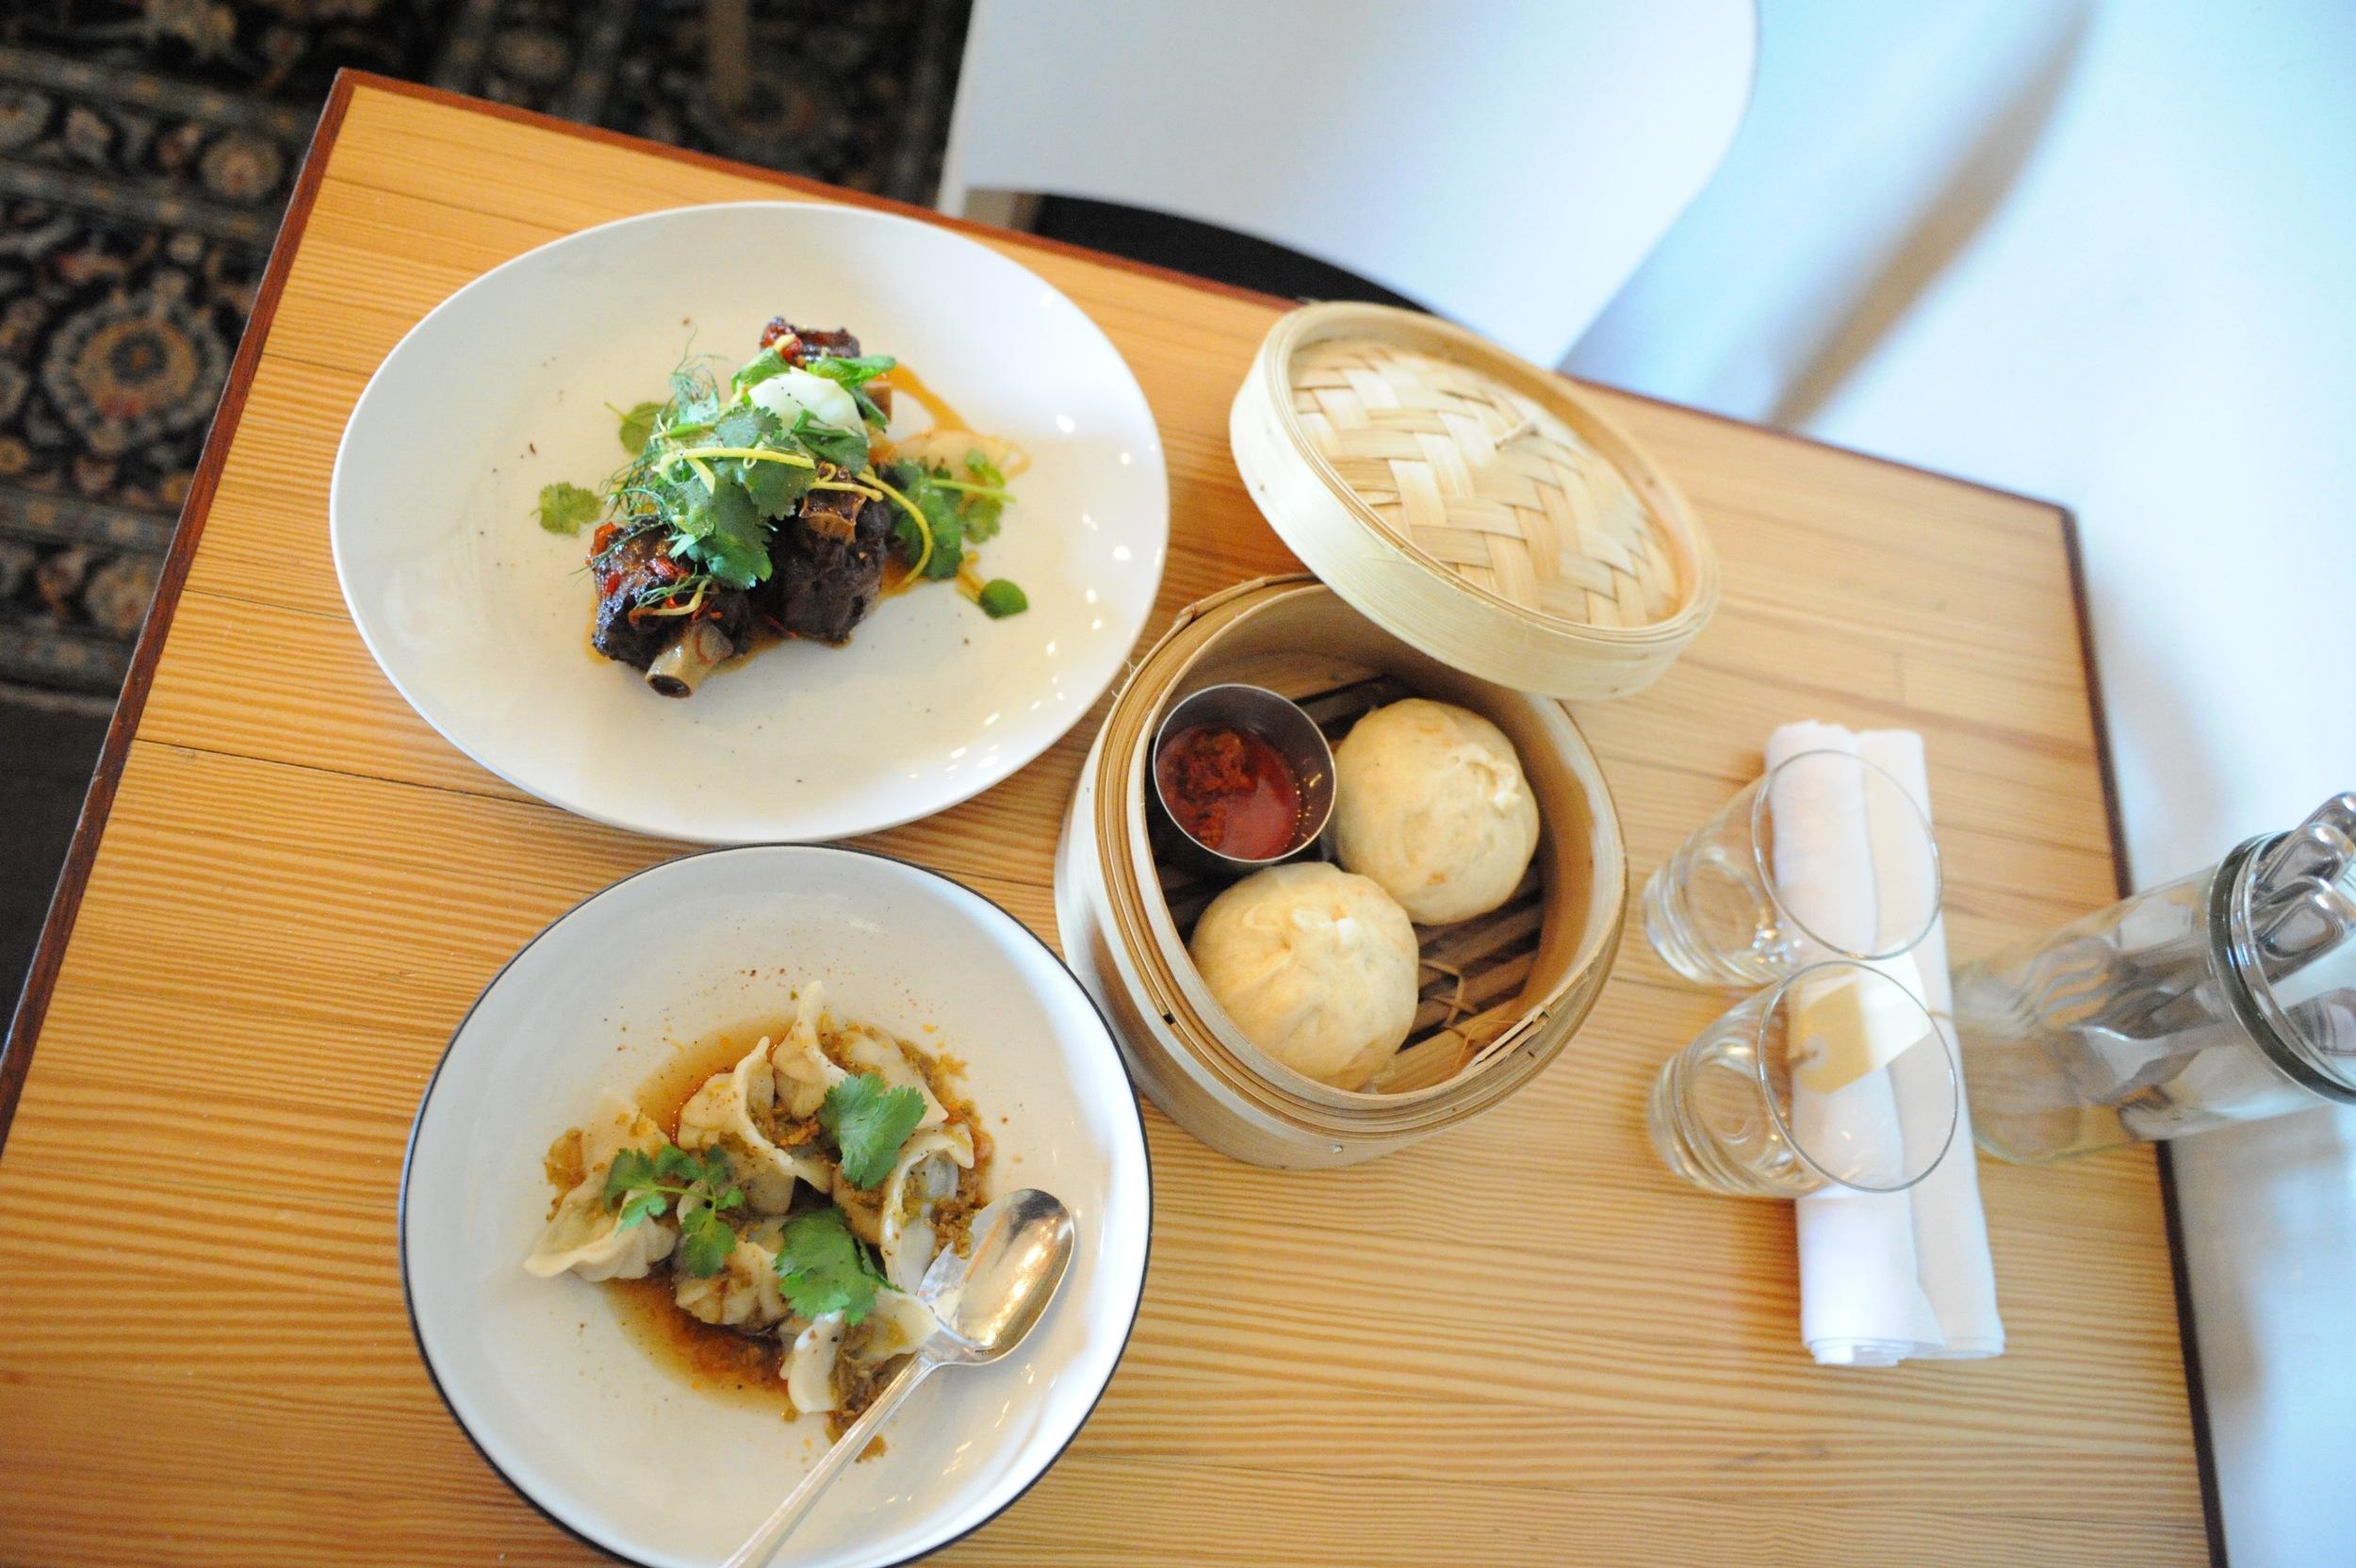 Entree selection of kangaroo tail, prawn dumplings and pork steam buns